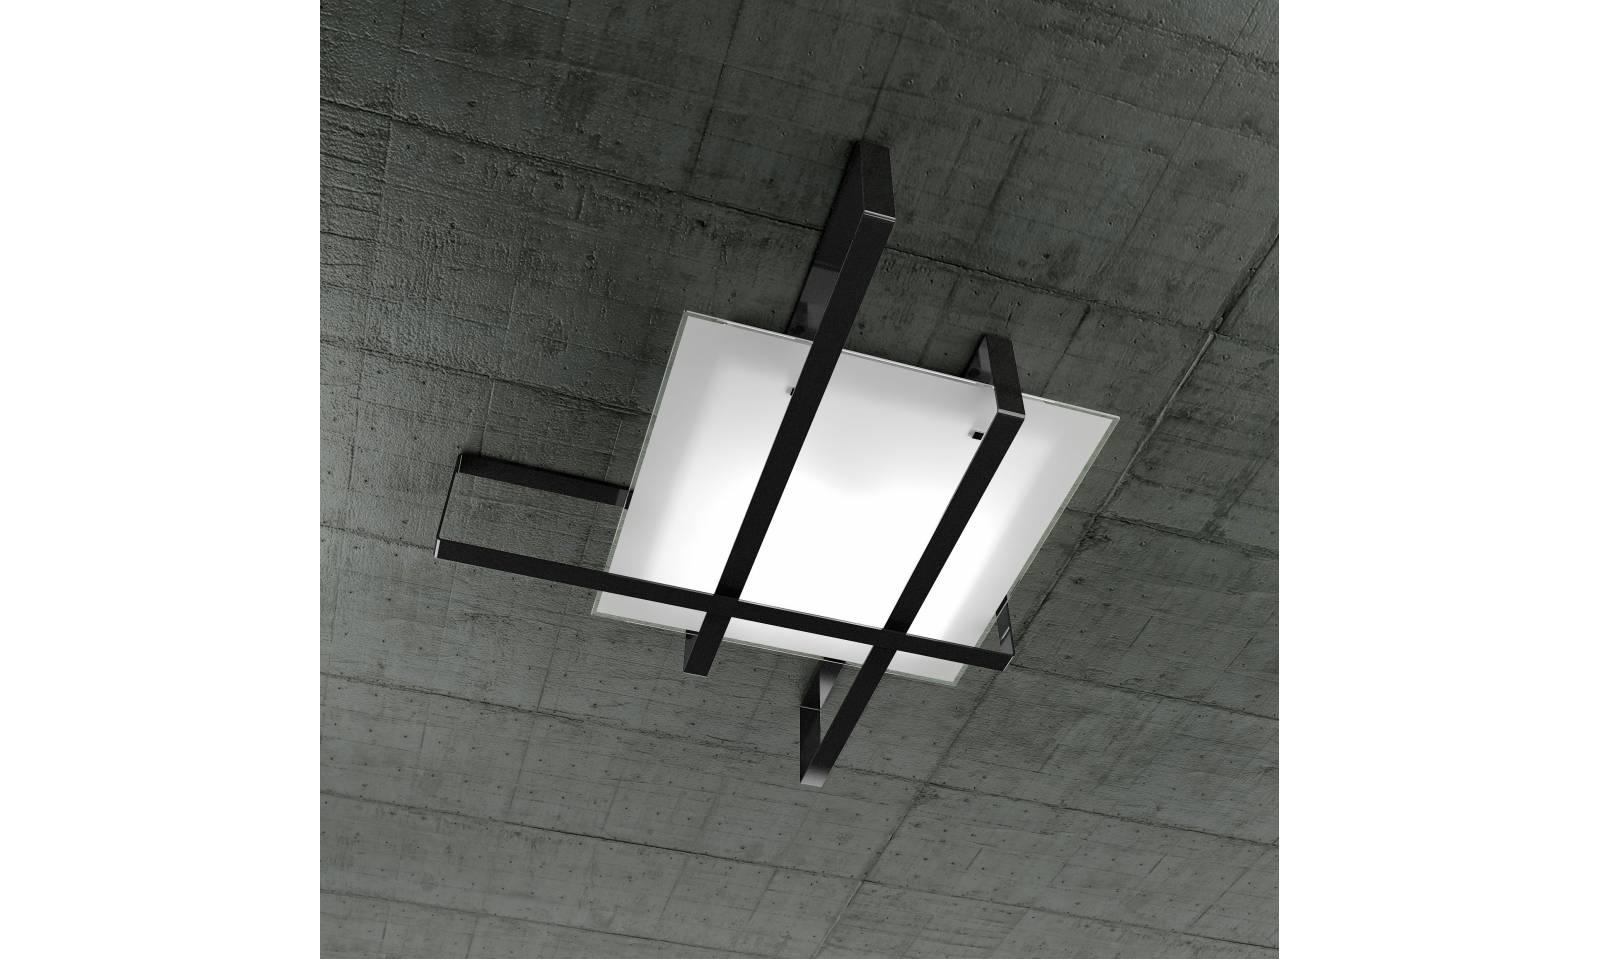 Ceiling Light Crossbar : Top light lights ceiling lamp grande cross